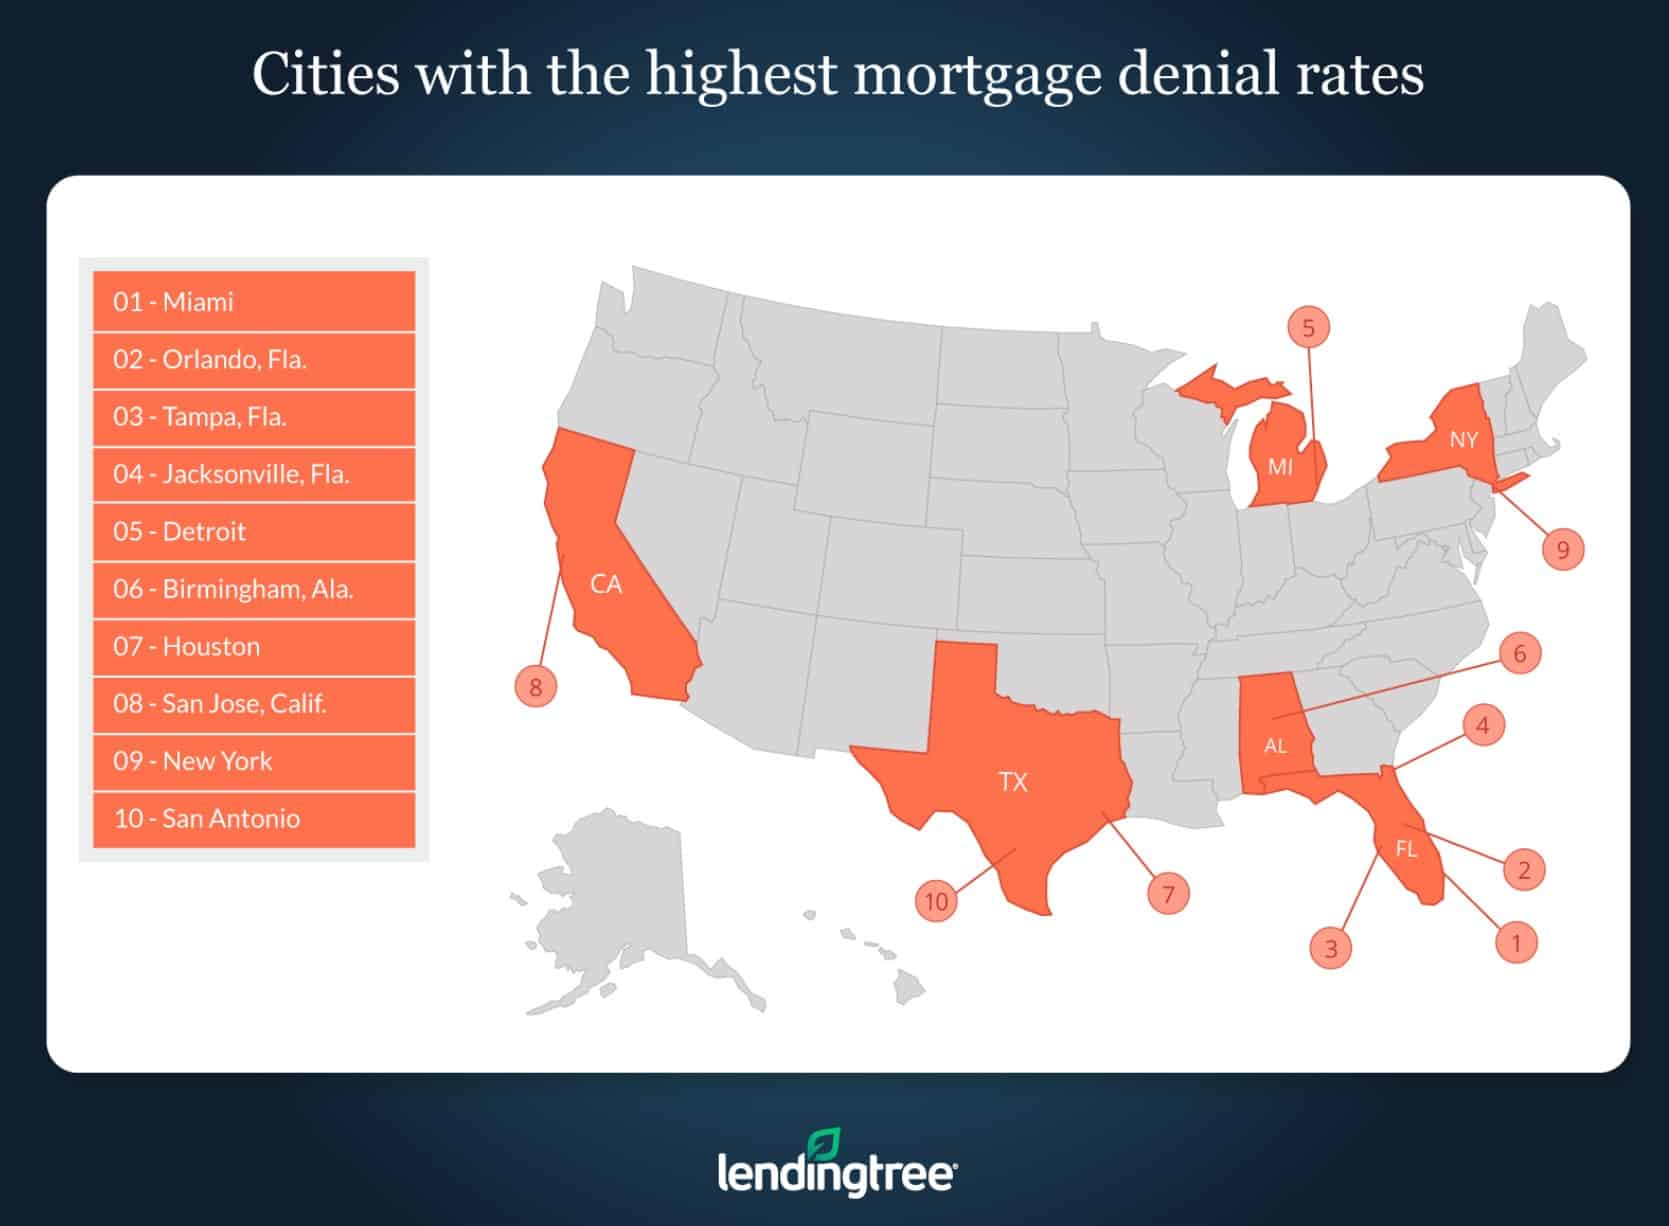 Mortgage denials - Top US cities